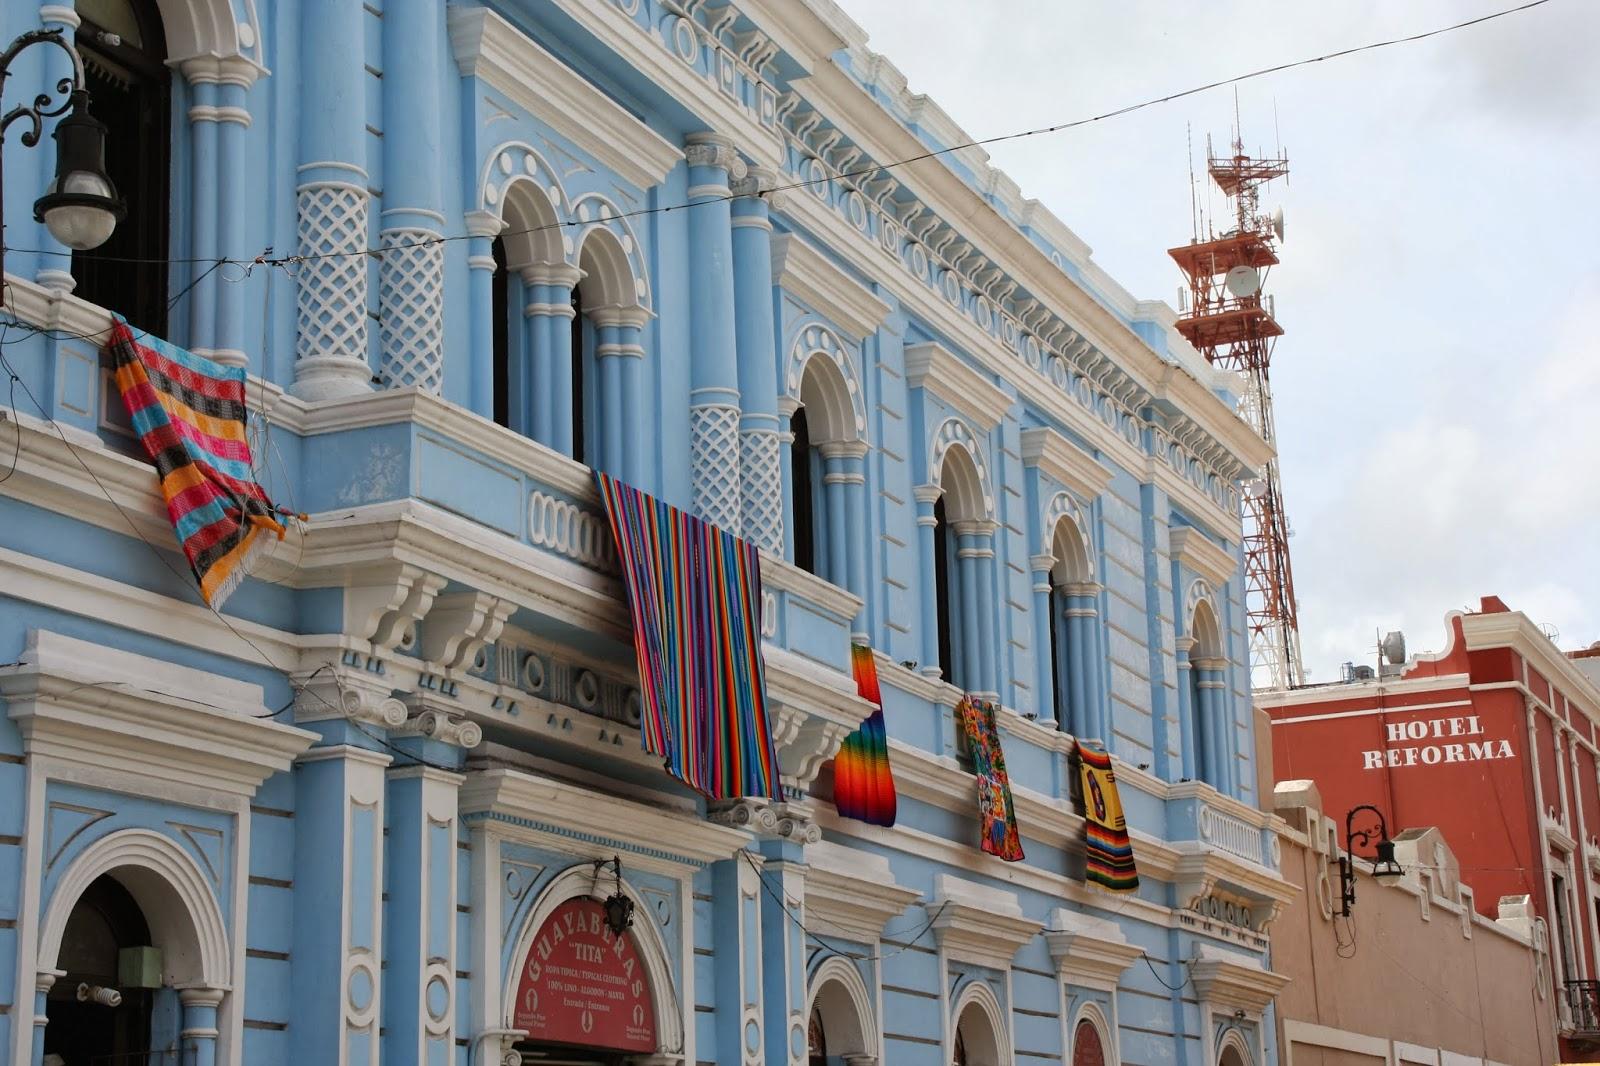 Pastel colonials near centro - A complete guide to Merida, Mexico